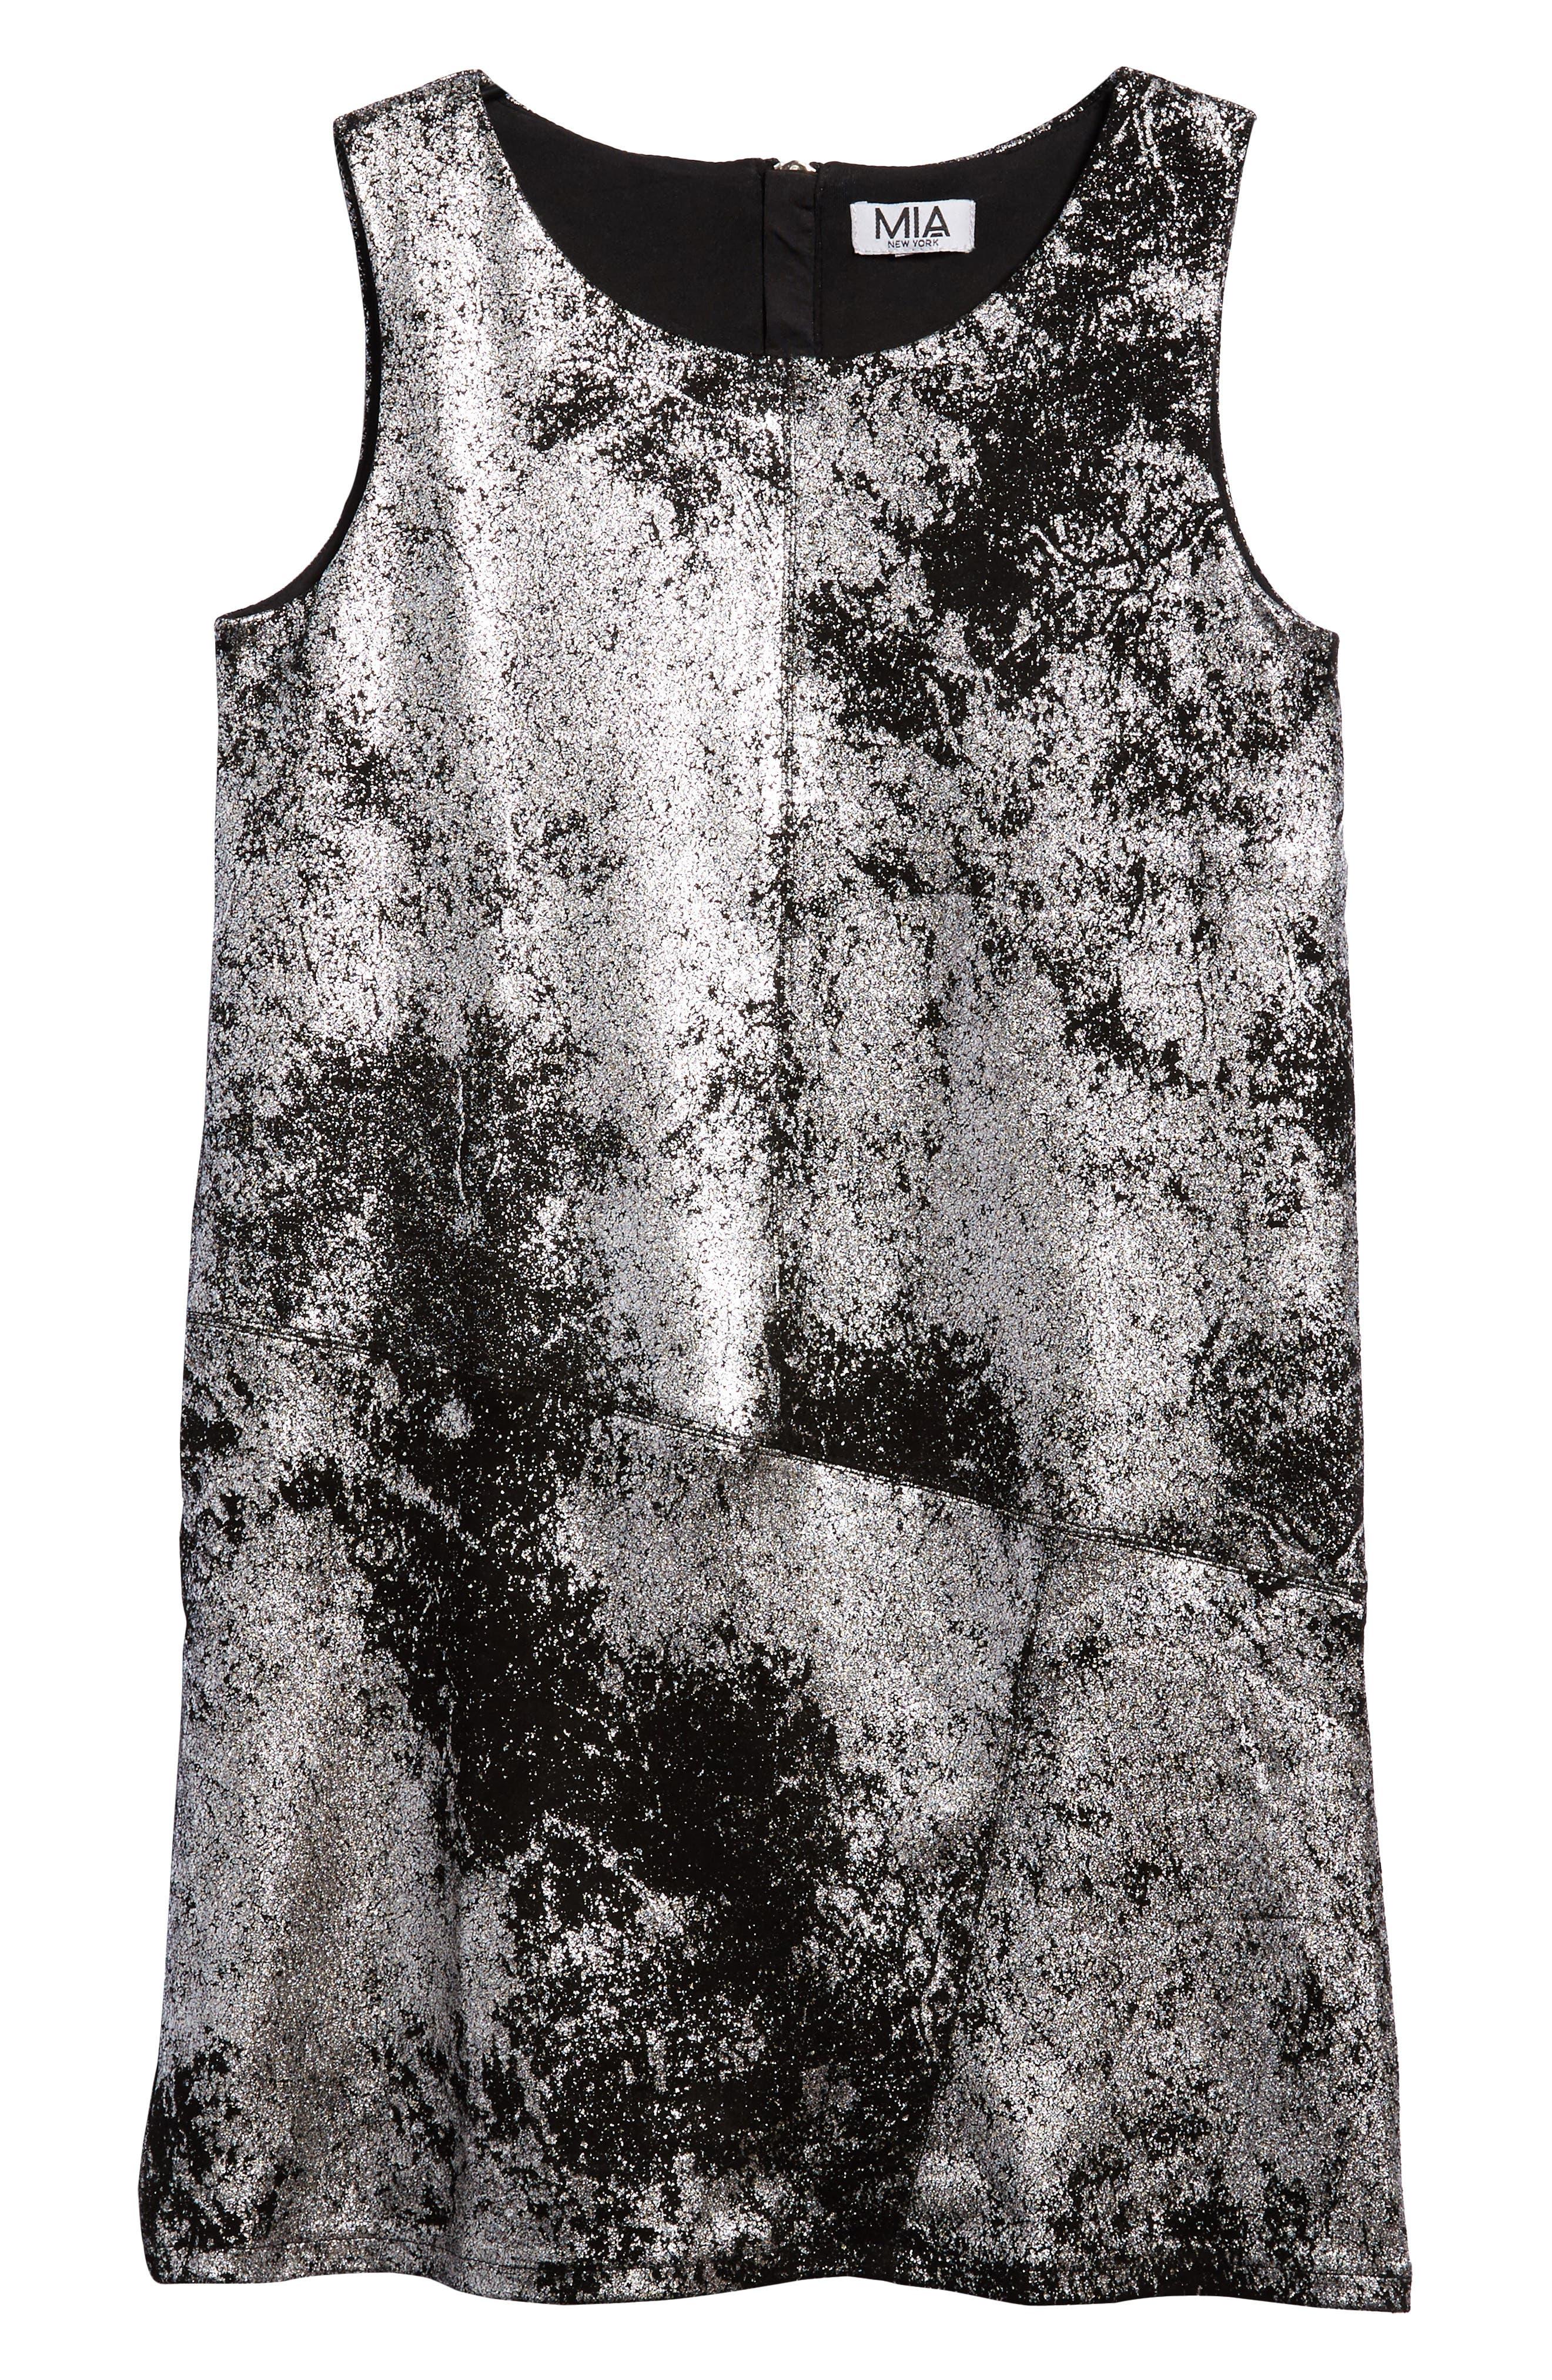 Mia New York Metallic A-Line Dress (Big Girls)